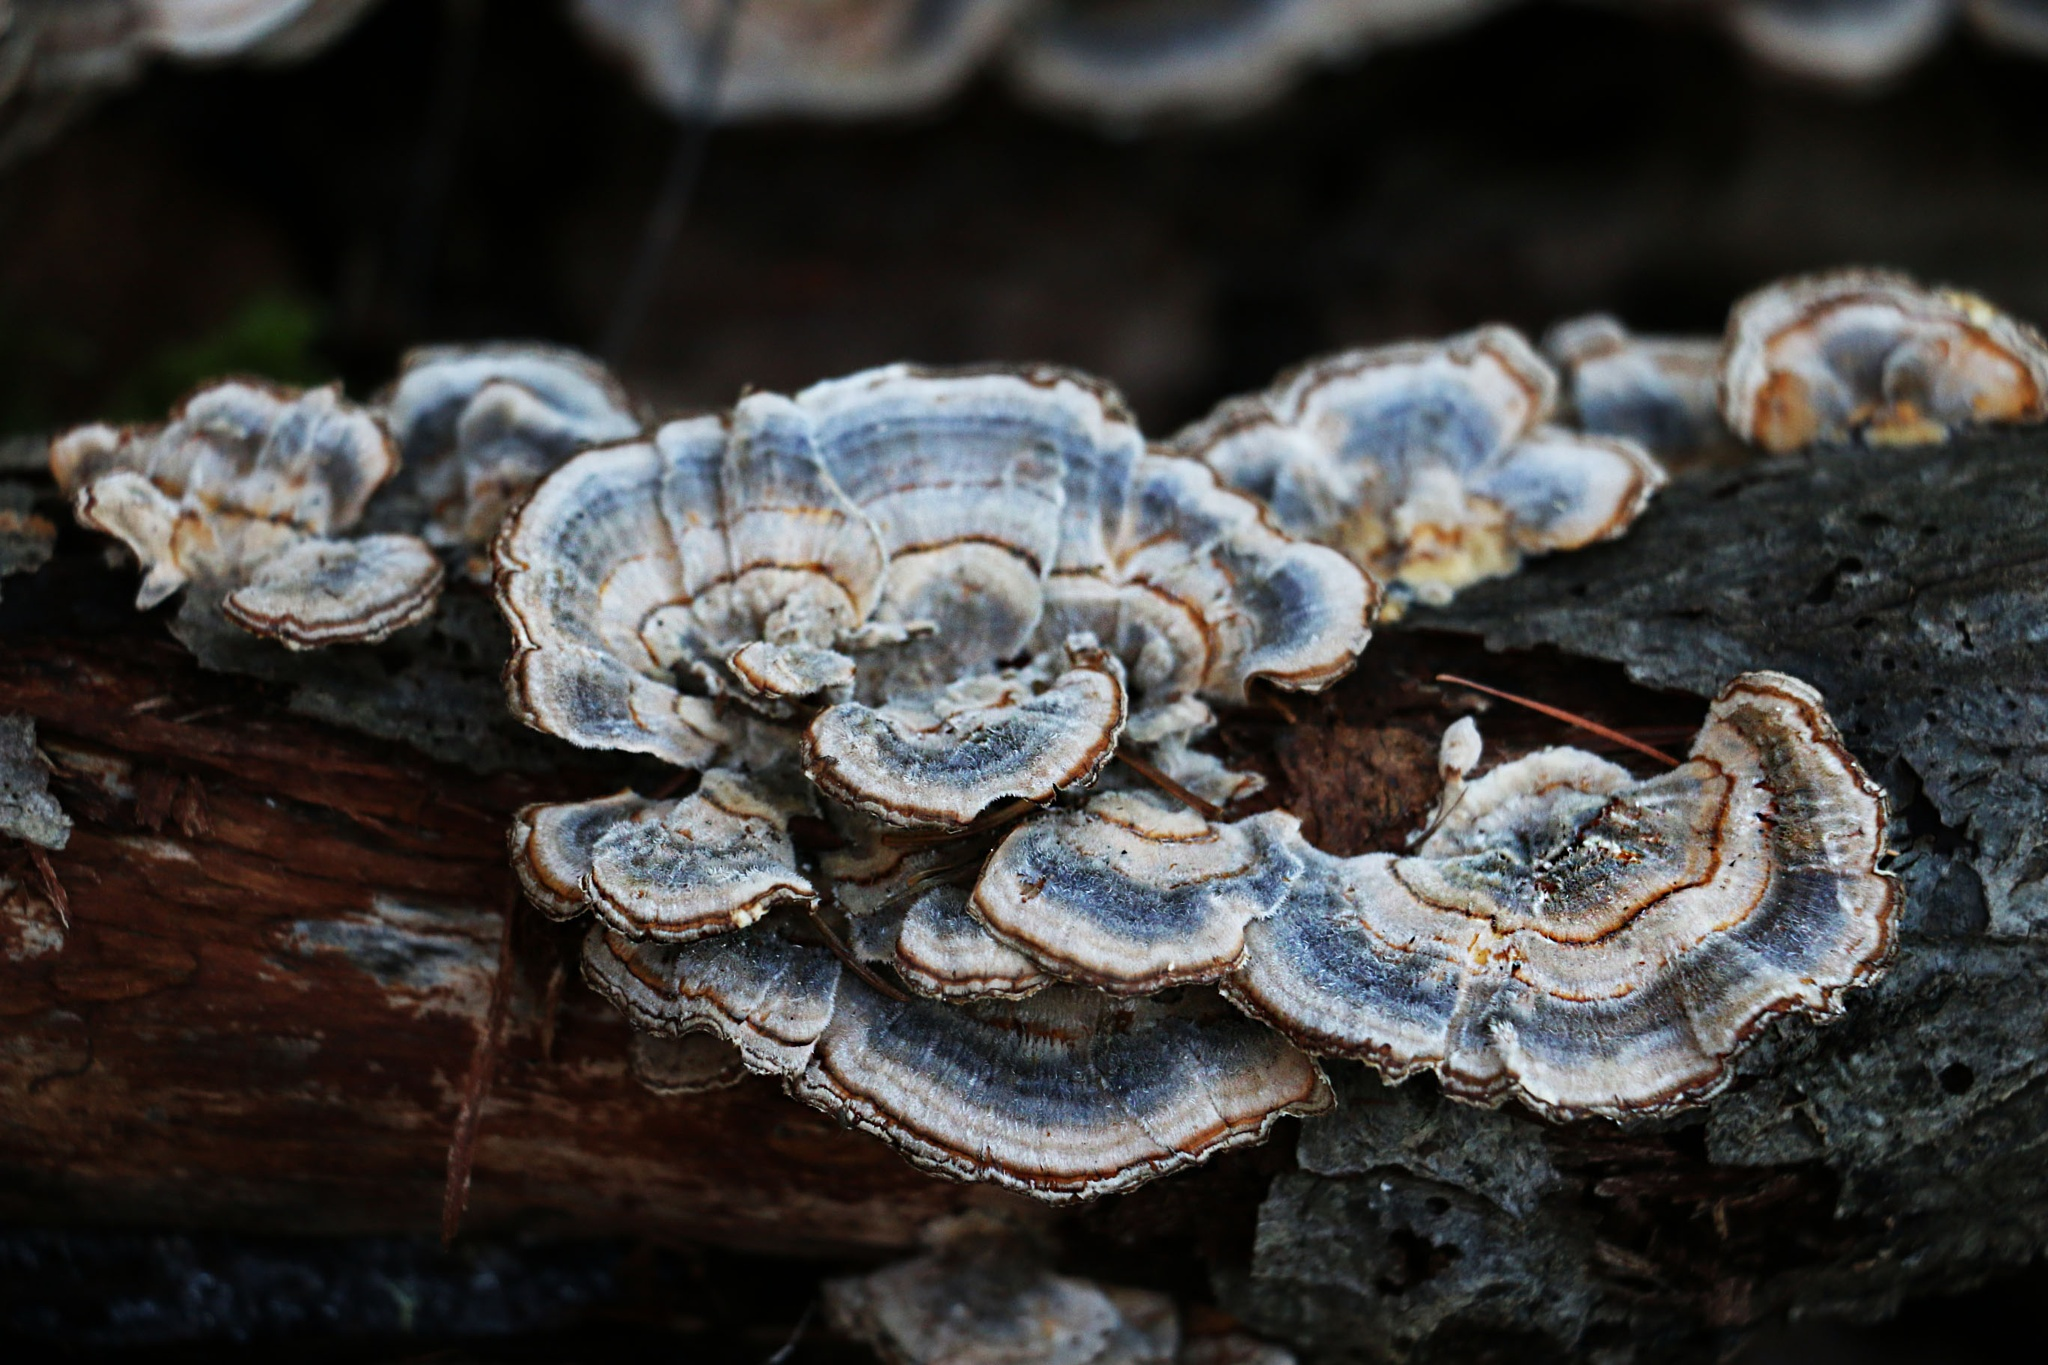 Fungi by BeePhotographer